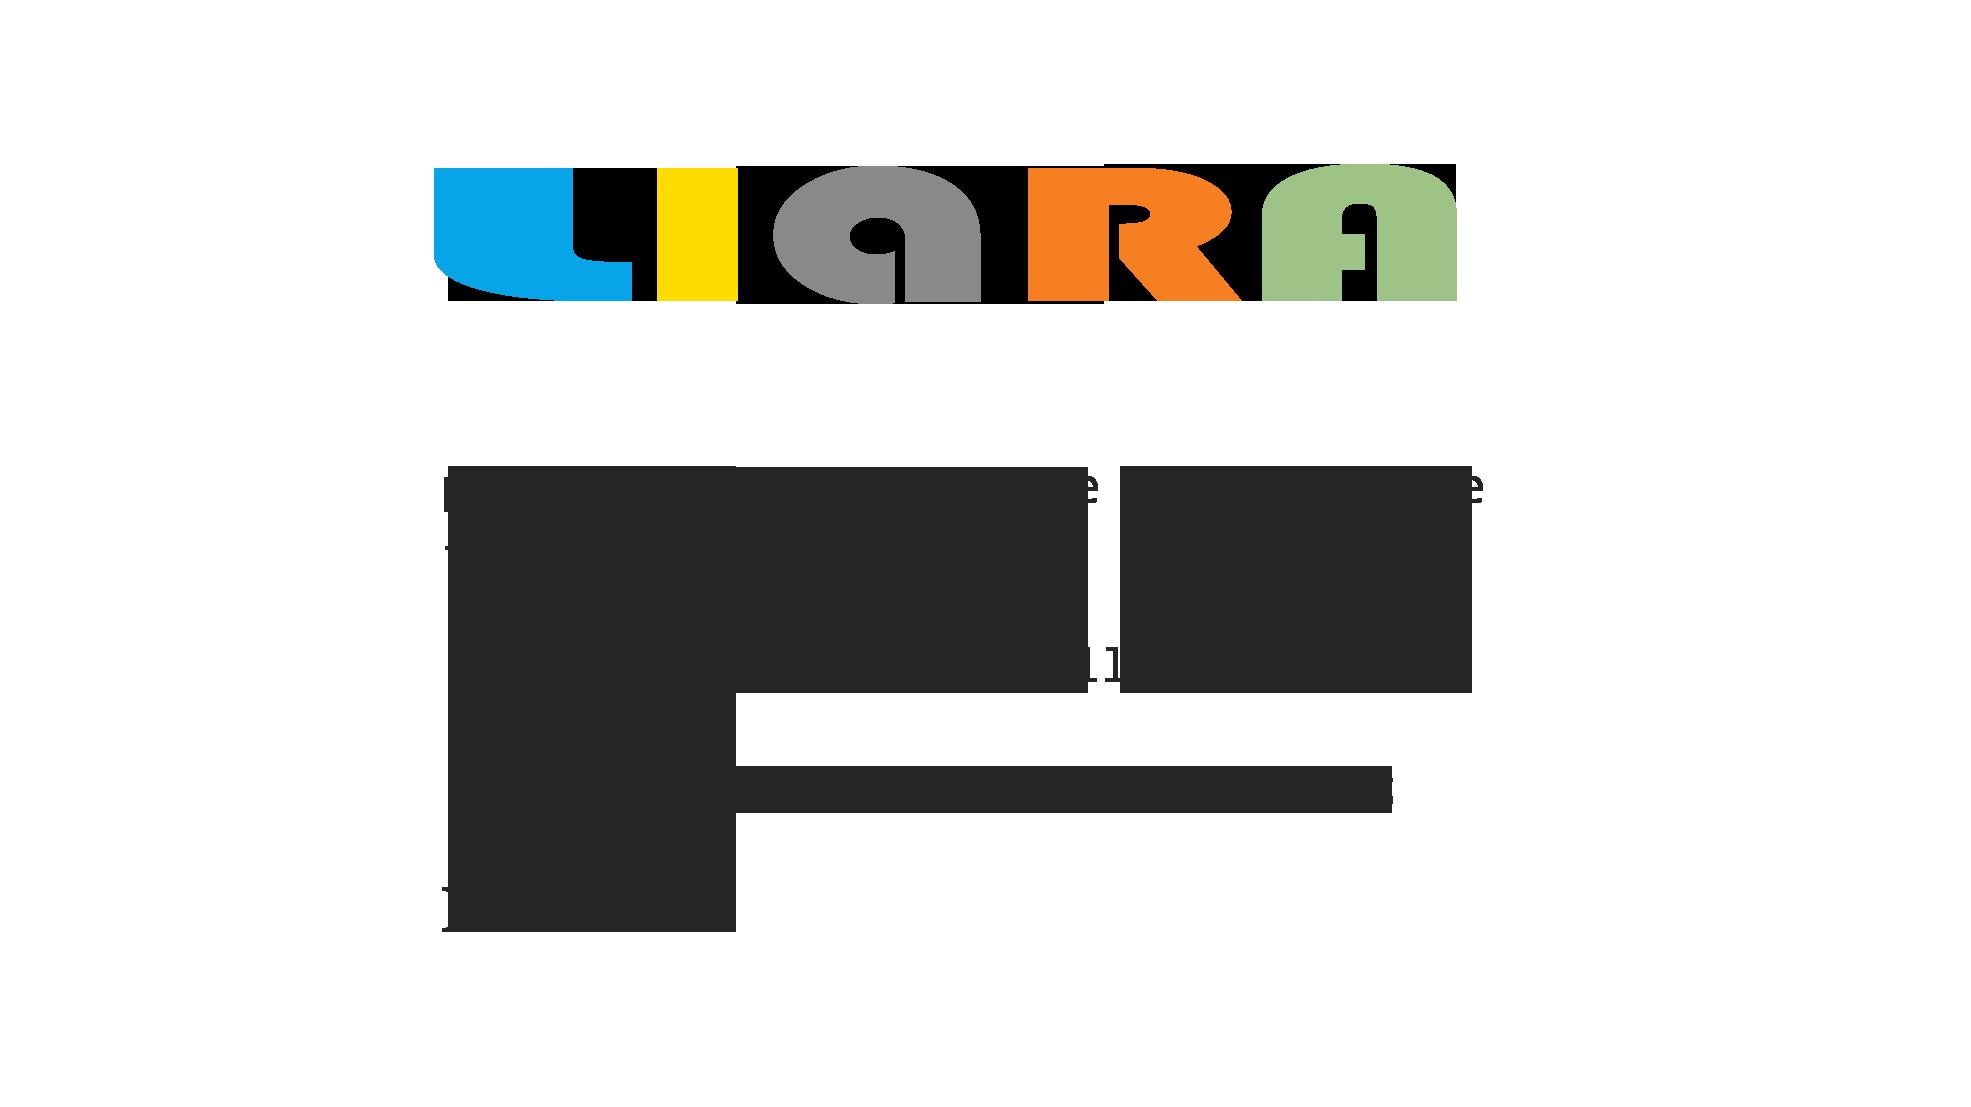 Liara Logo